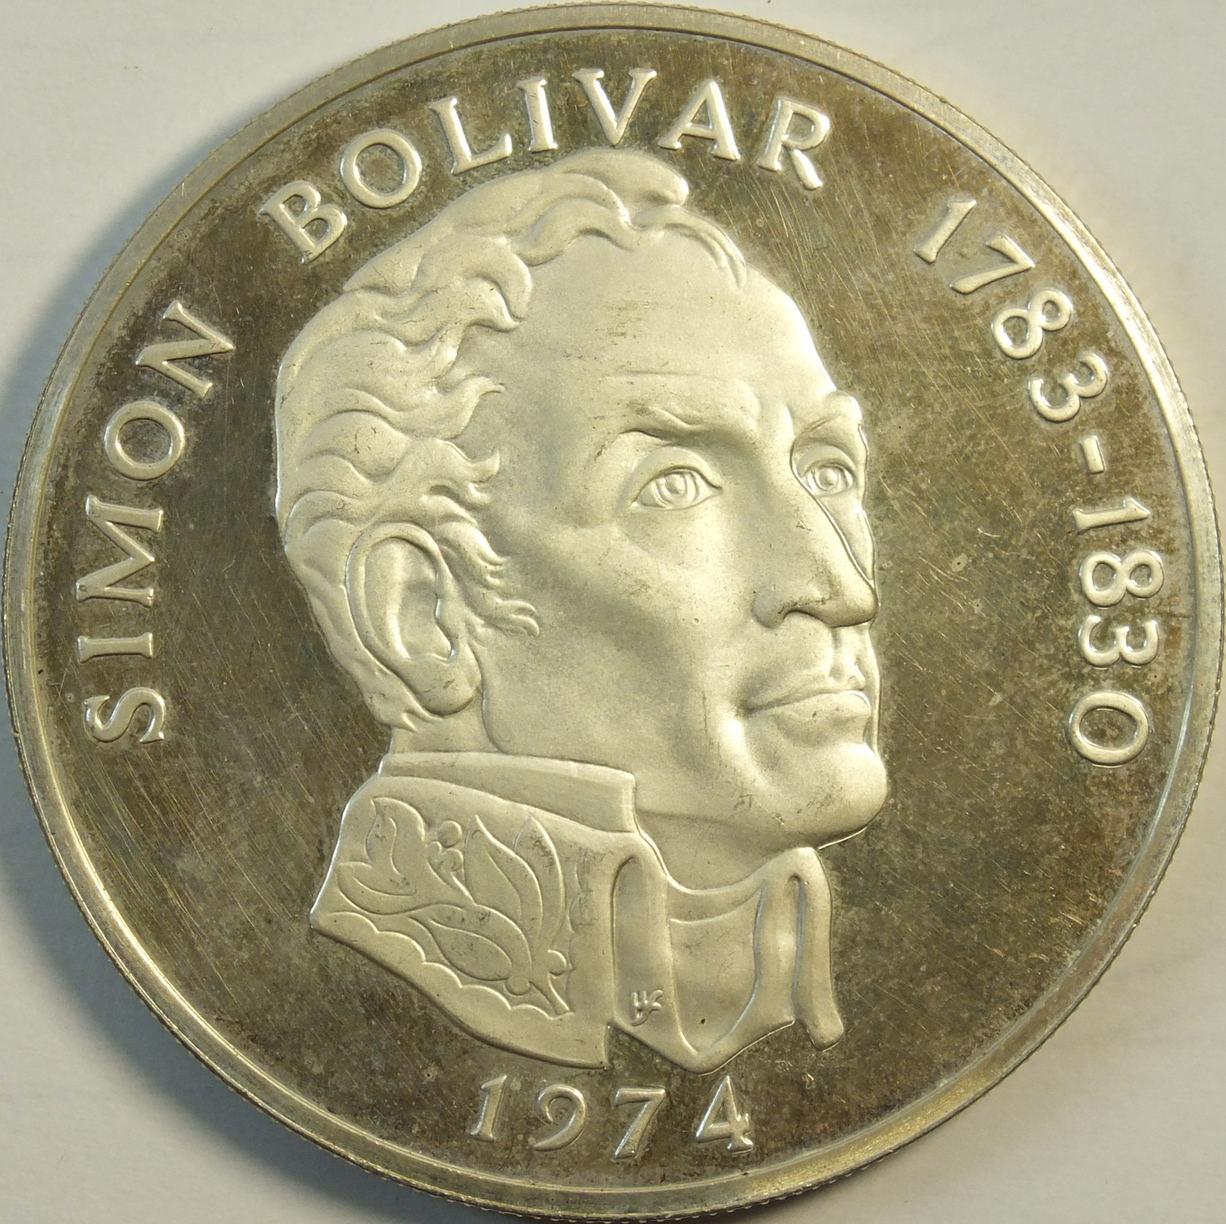 20 Balboas 1974 Pannama Simon Boliva PP